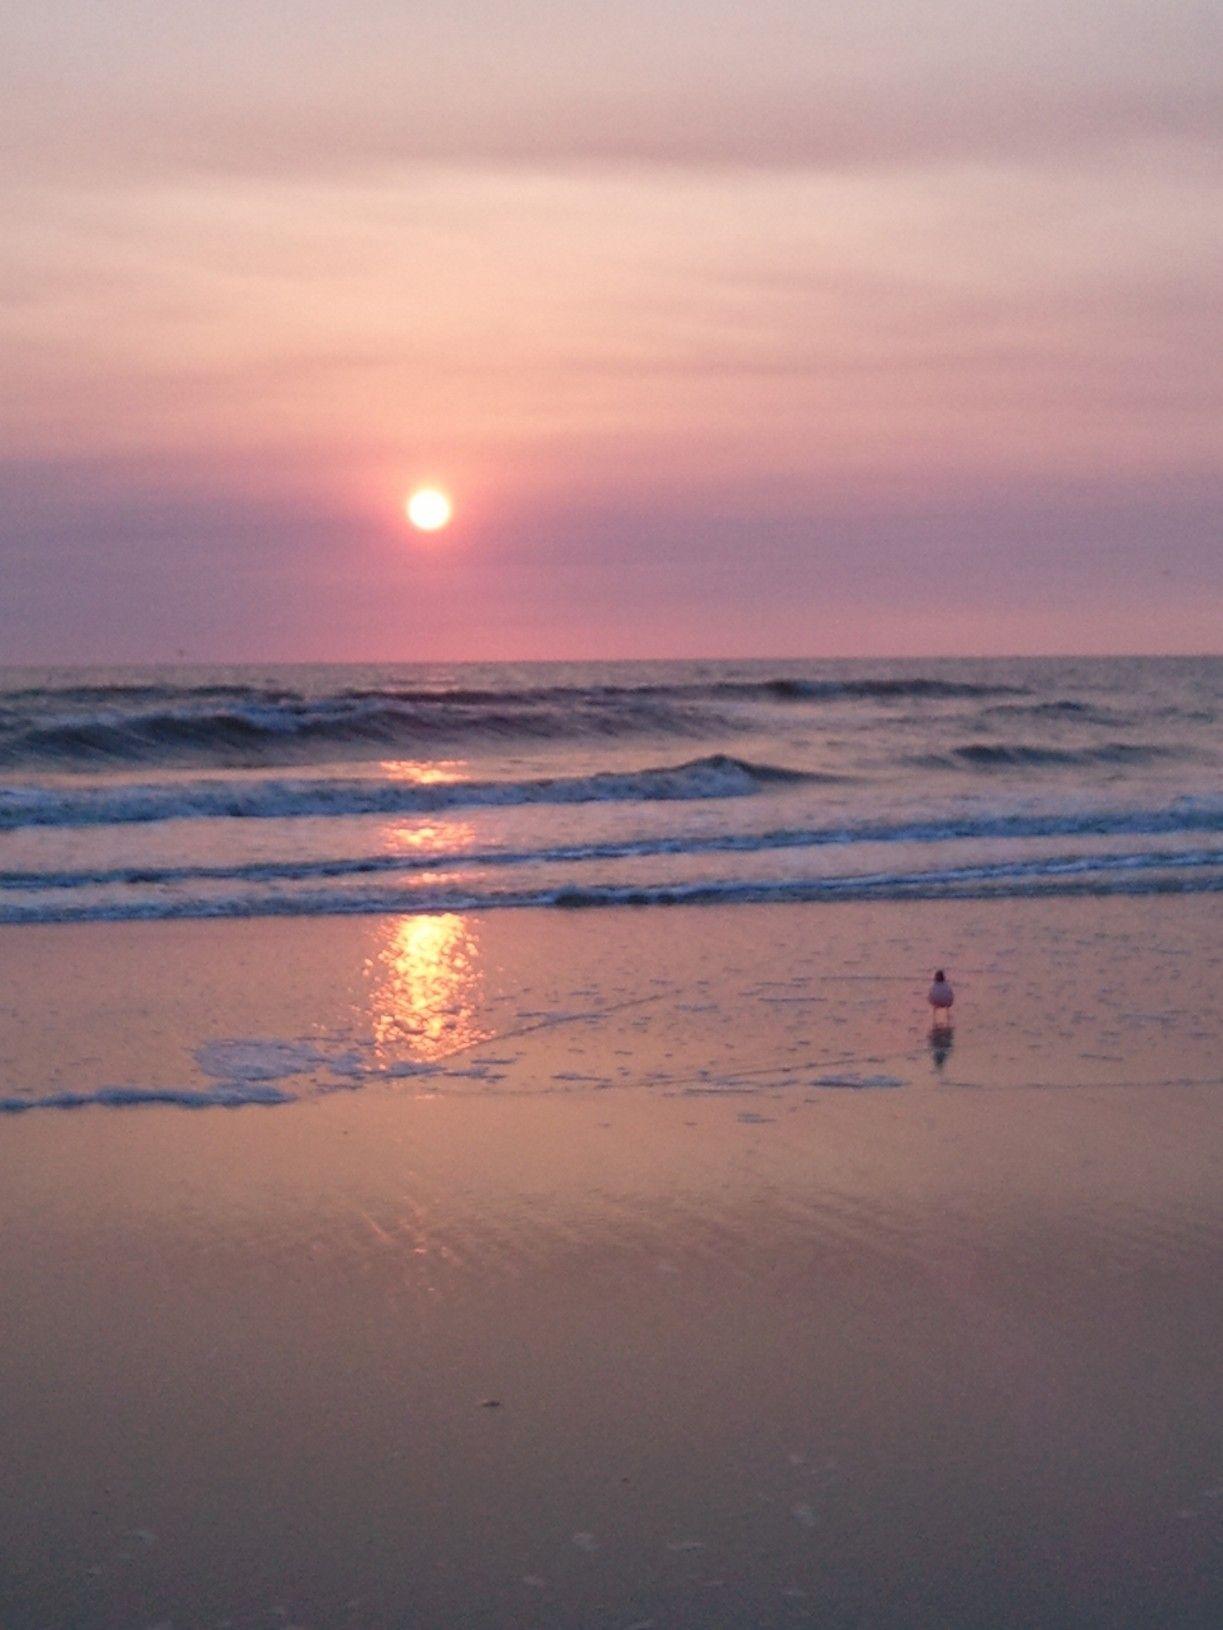 Sunrise Atlantic Beach Fl In Just 9 More Days Praying For Beautiful Weather Sunrise Beach Atlantic Beach Atlantic Beach Fl